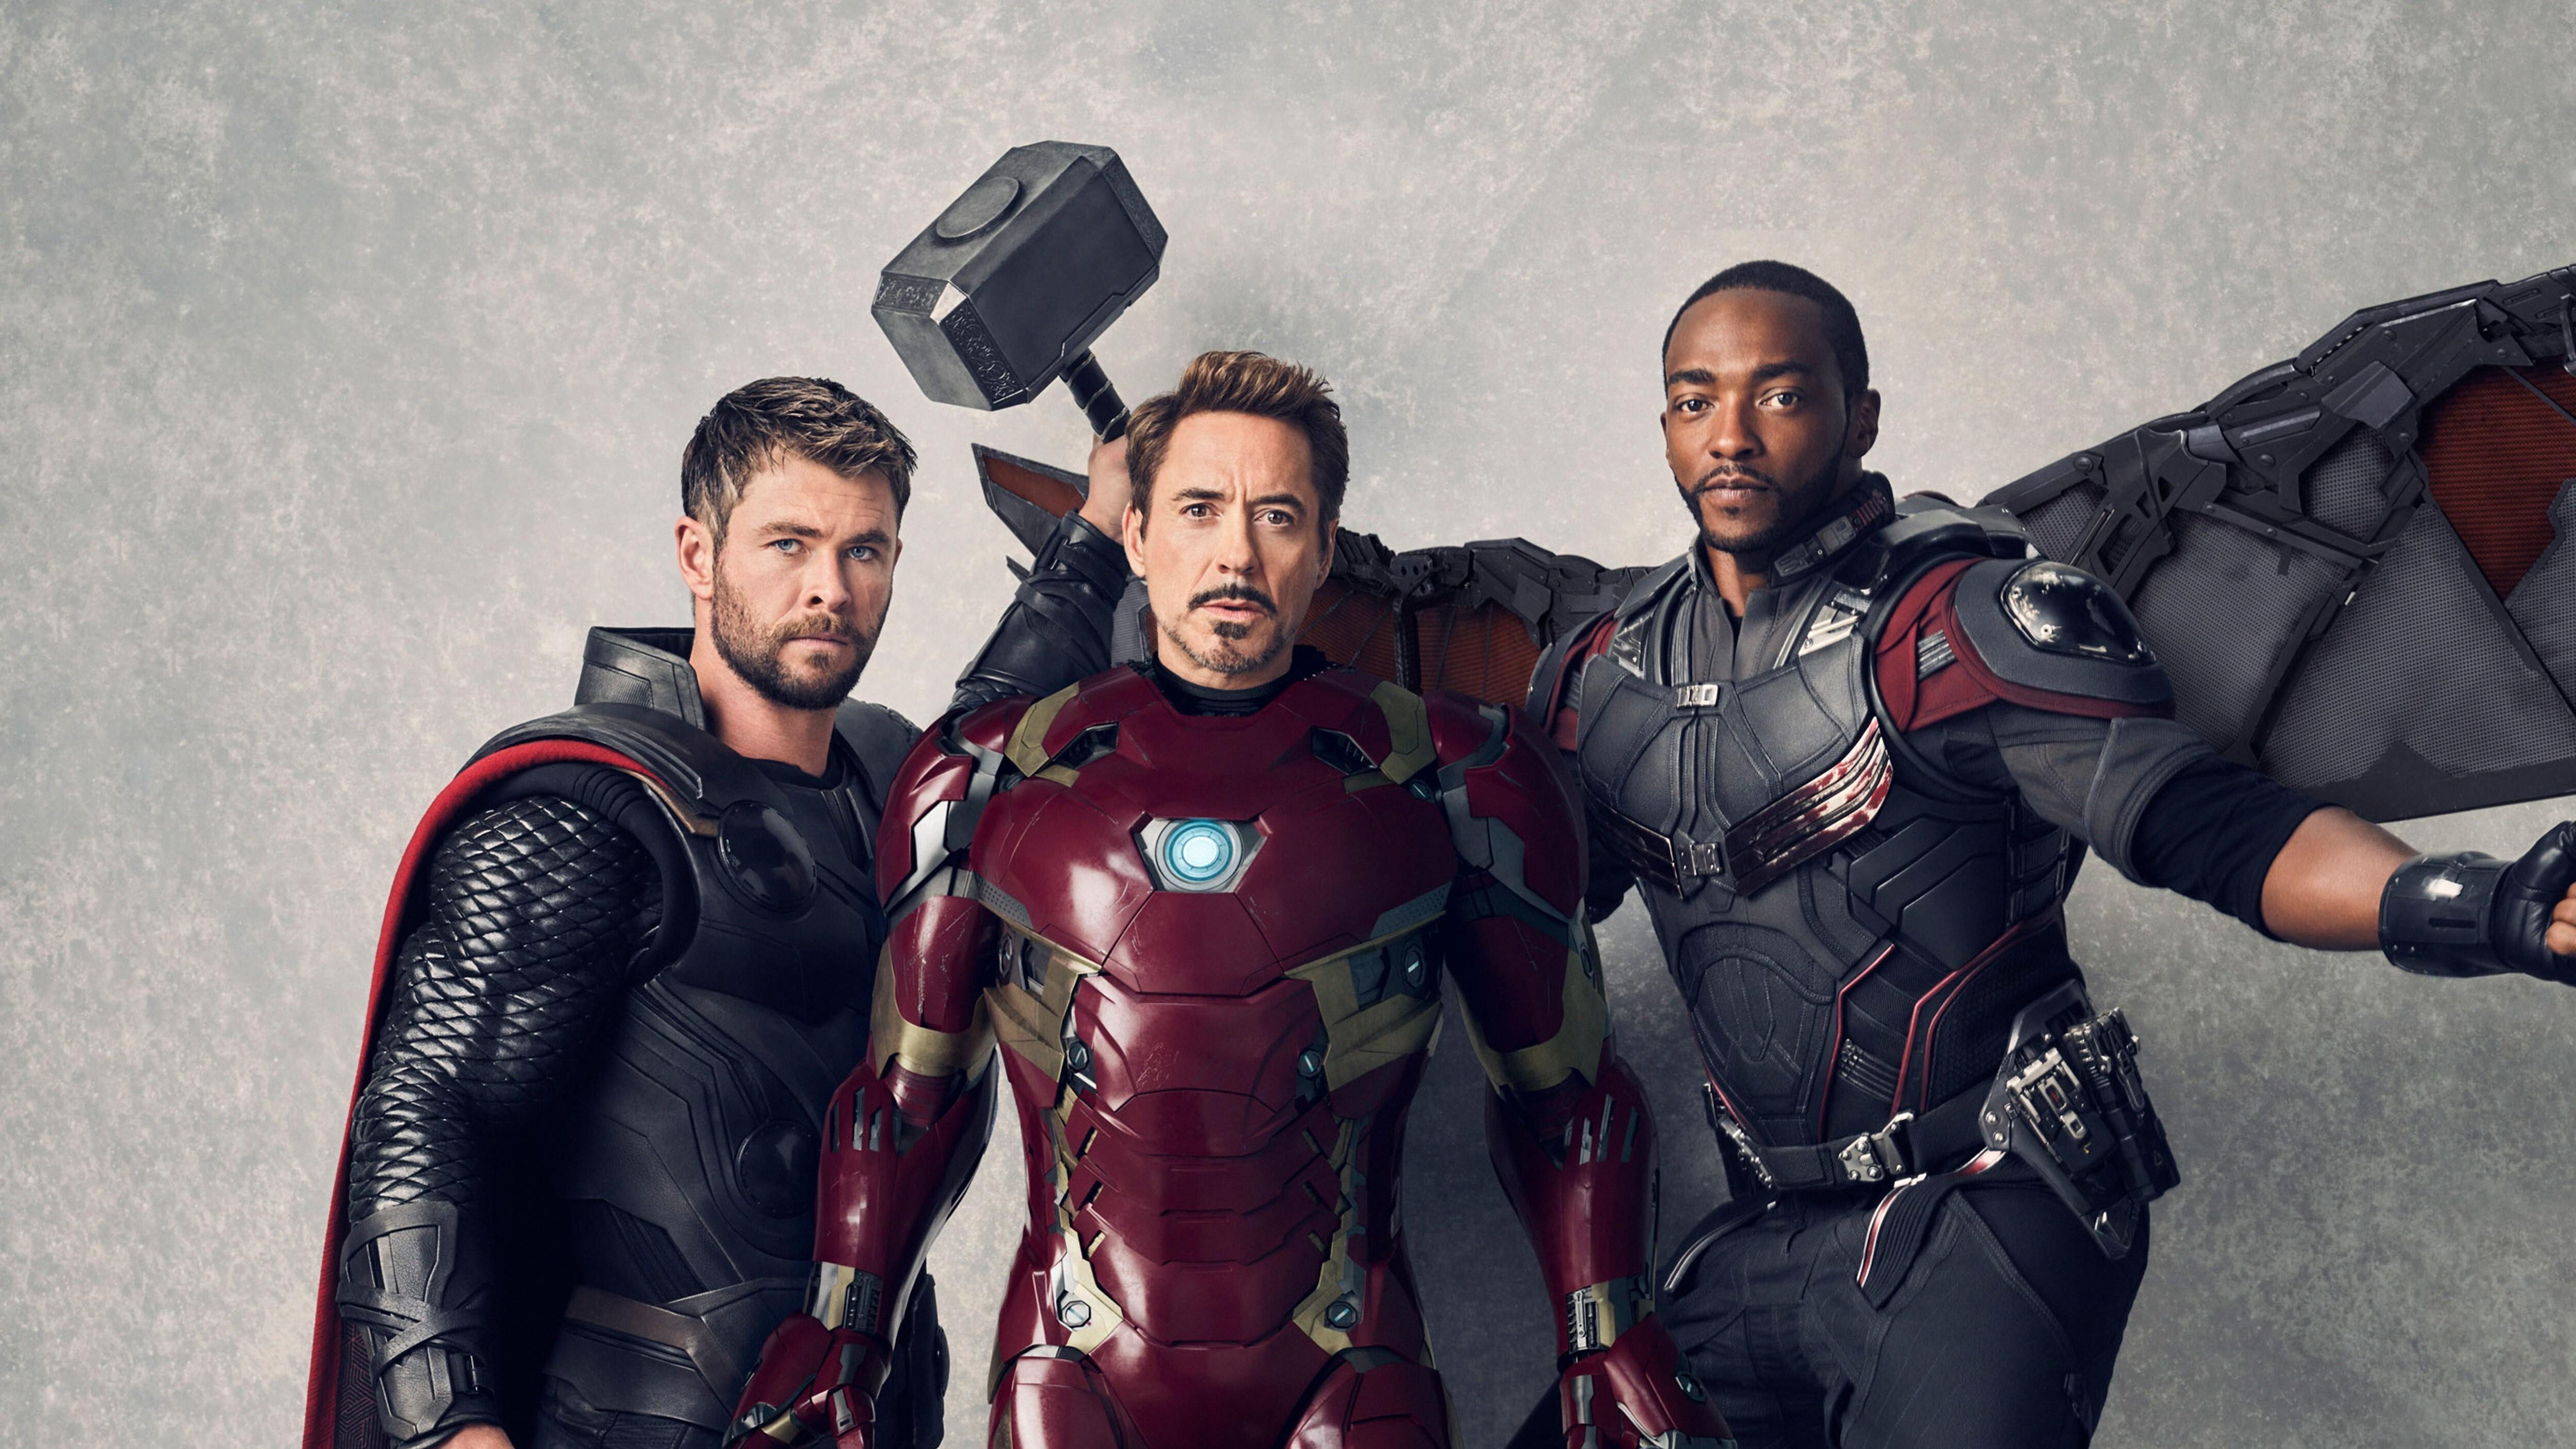 Avengers Infinity War Movie Star 5k Wallpaper Hd Wallpapers